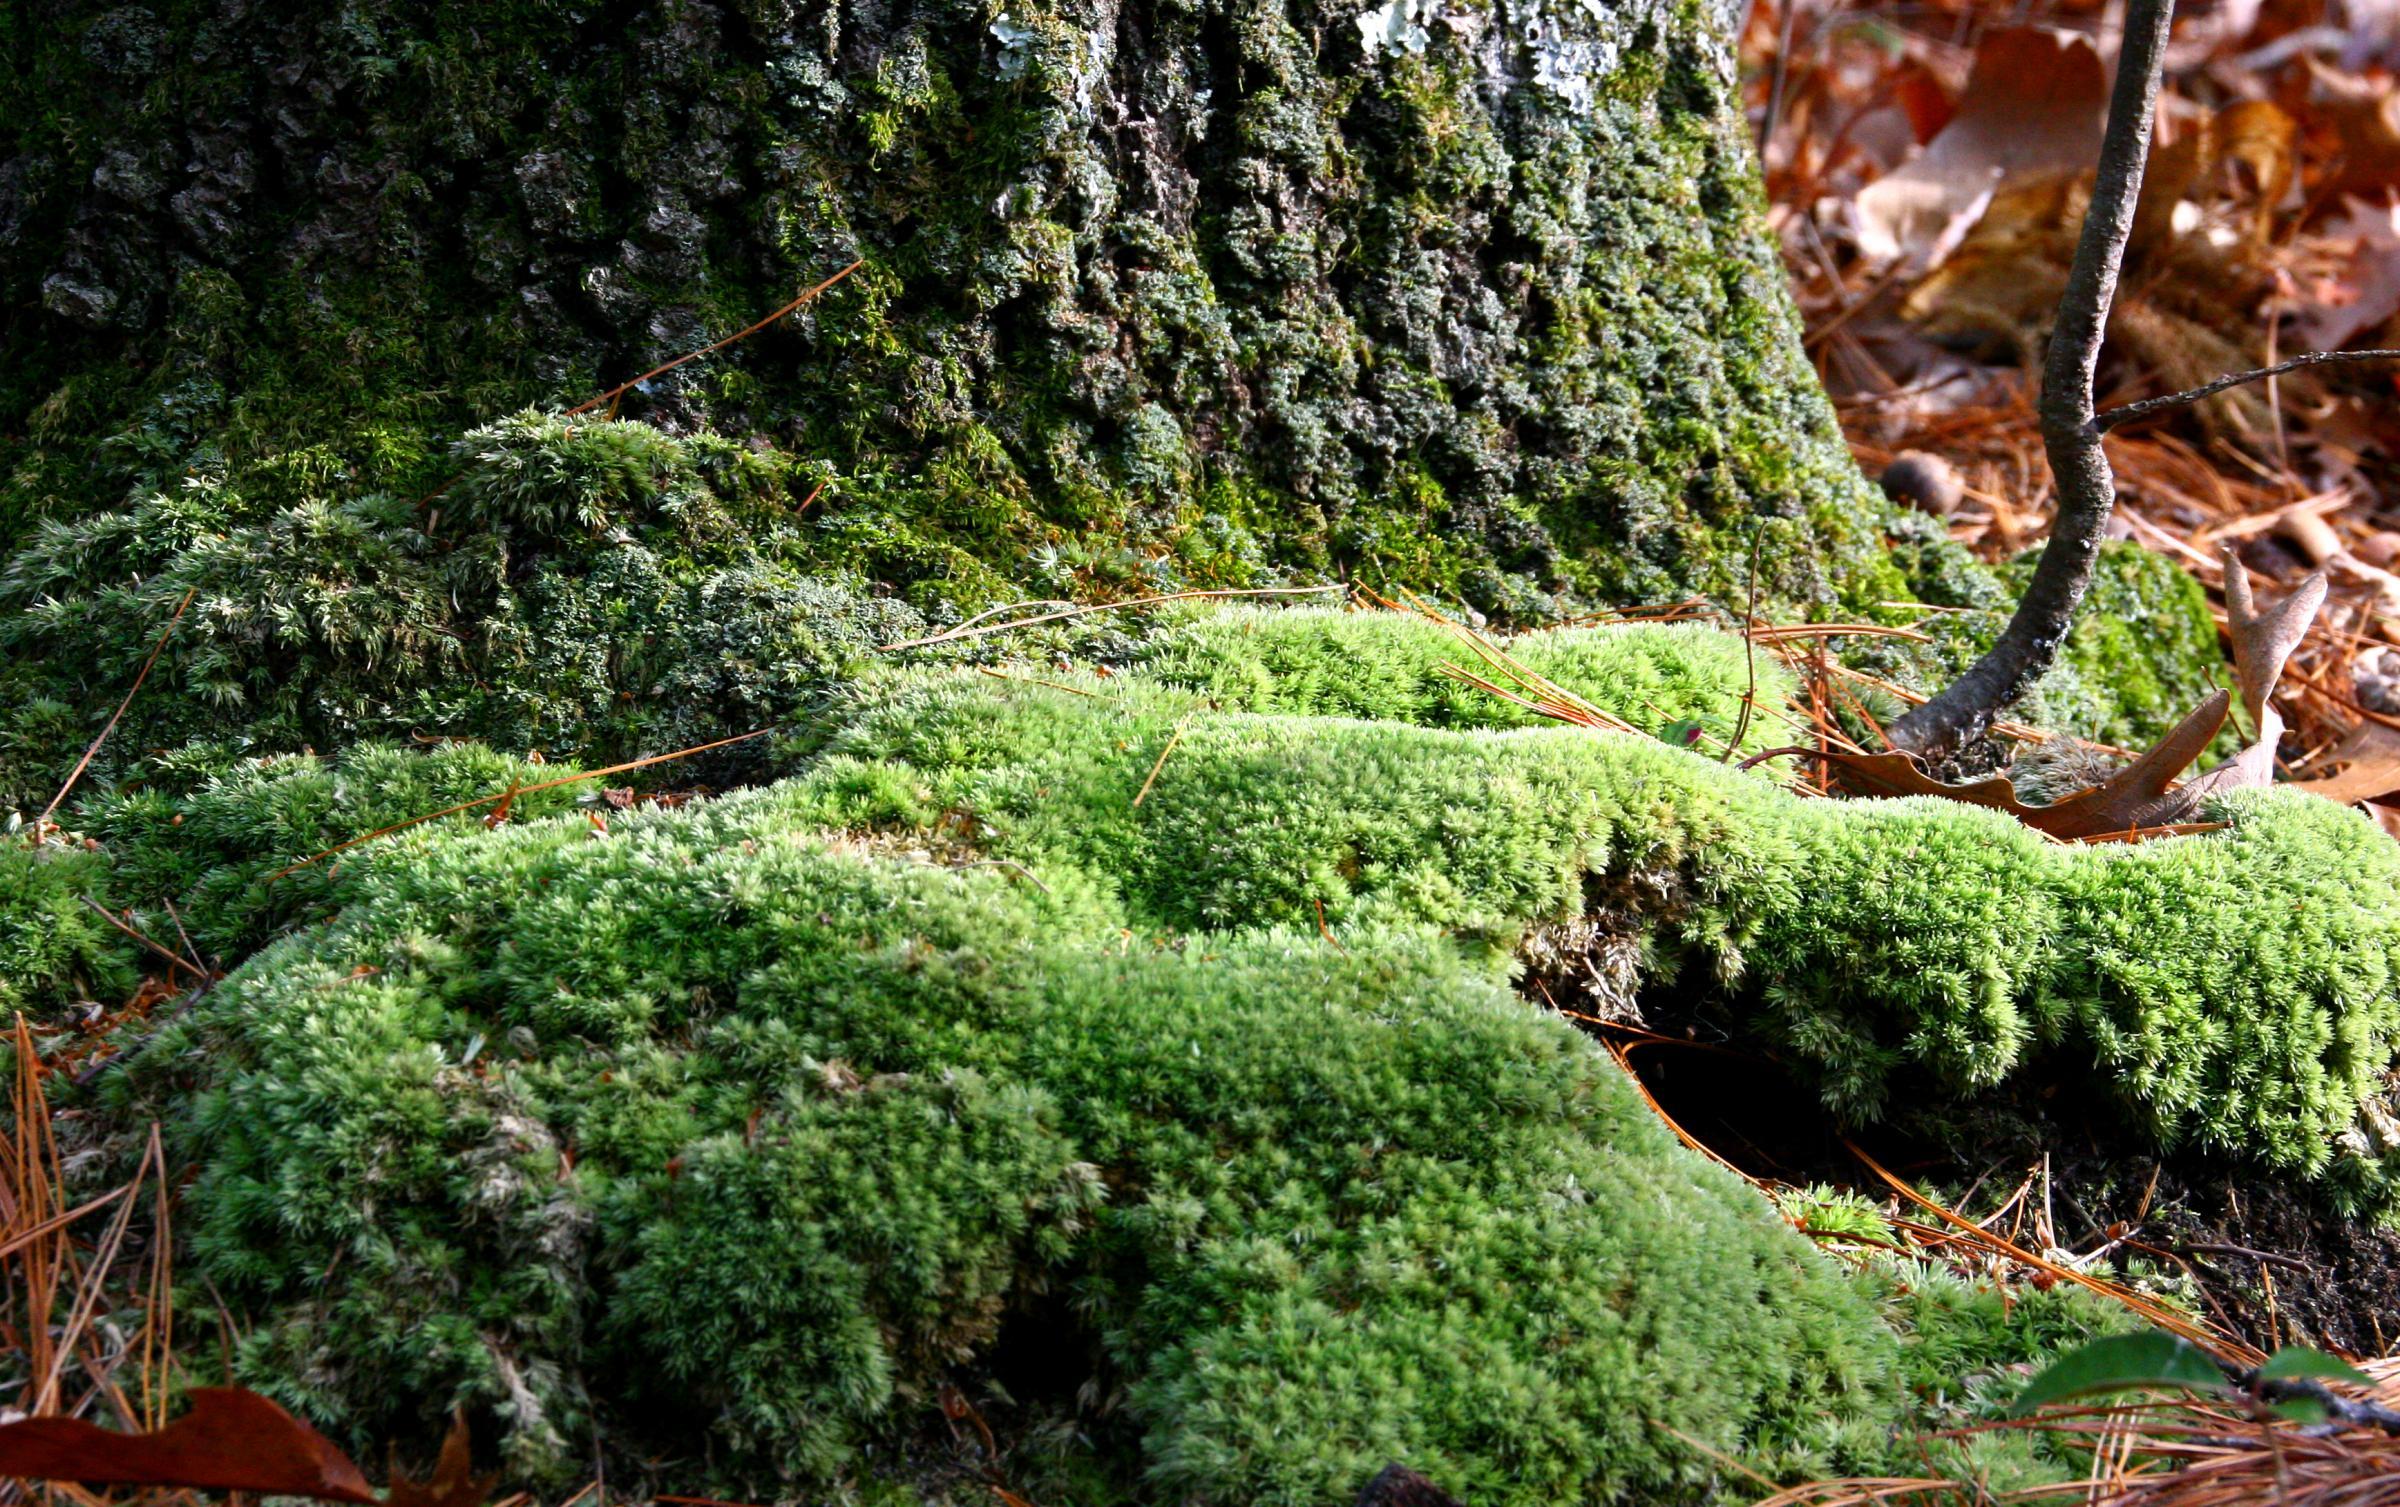 Glt S Grow Moss As Lawn Alternative Wglt